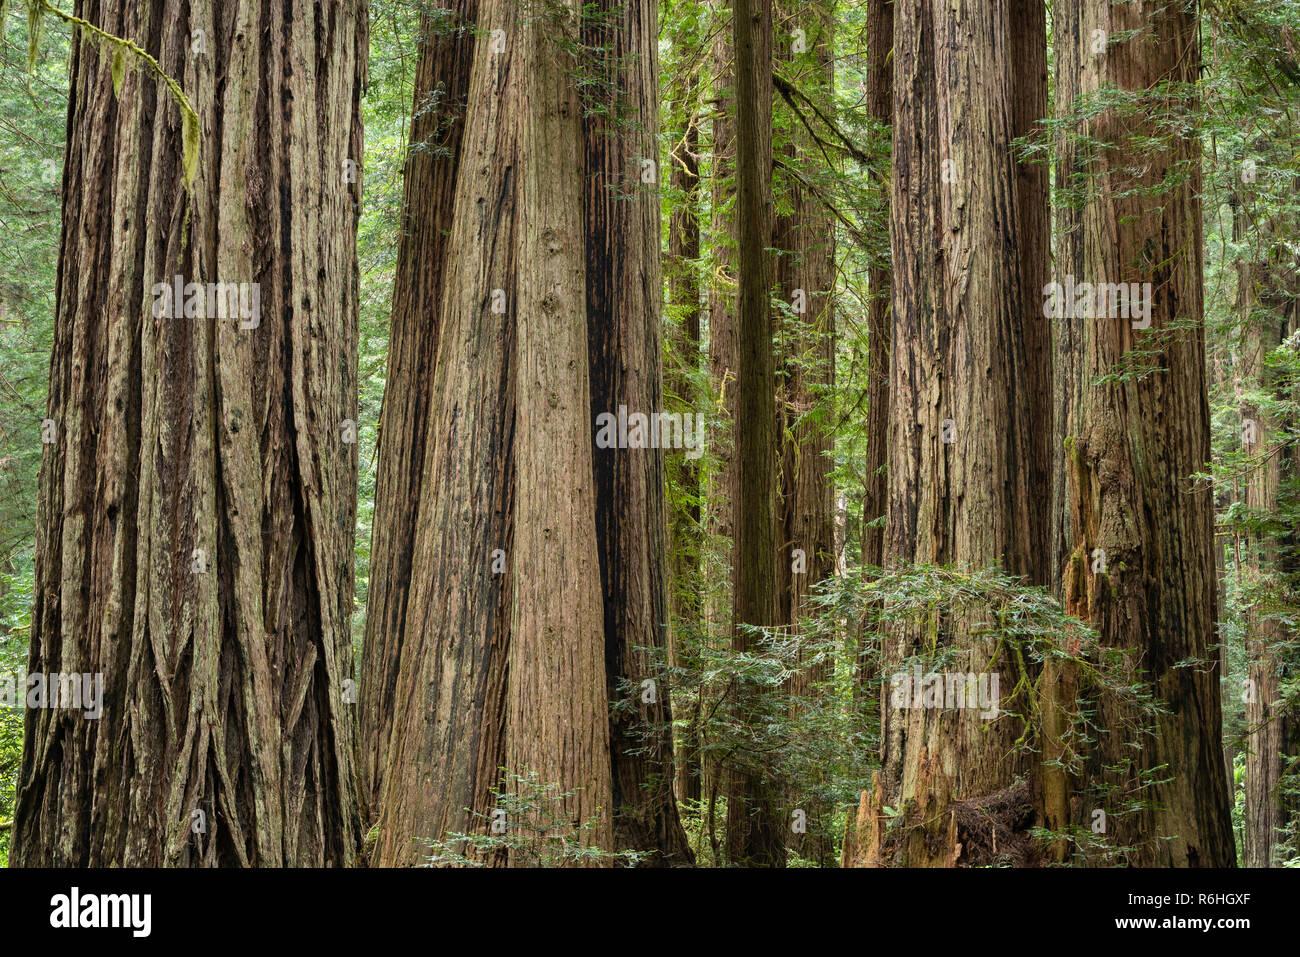 Giant redwood trees along Cal Barrel Road in Prairie Creek Redwoods State Park, California. - Stock Image